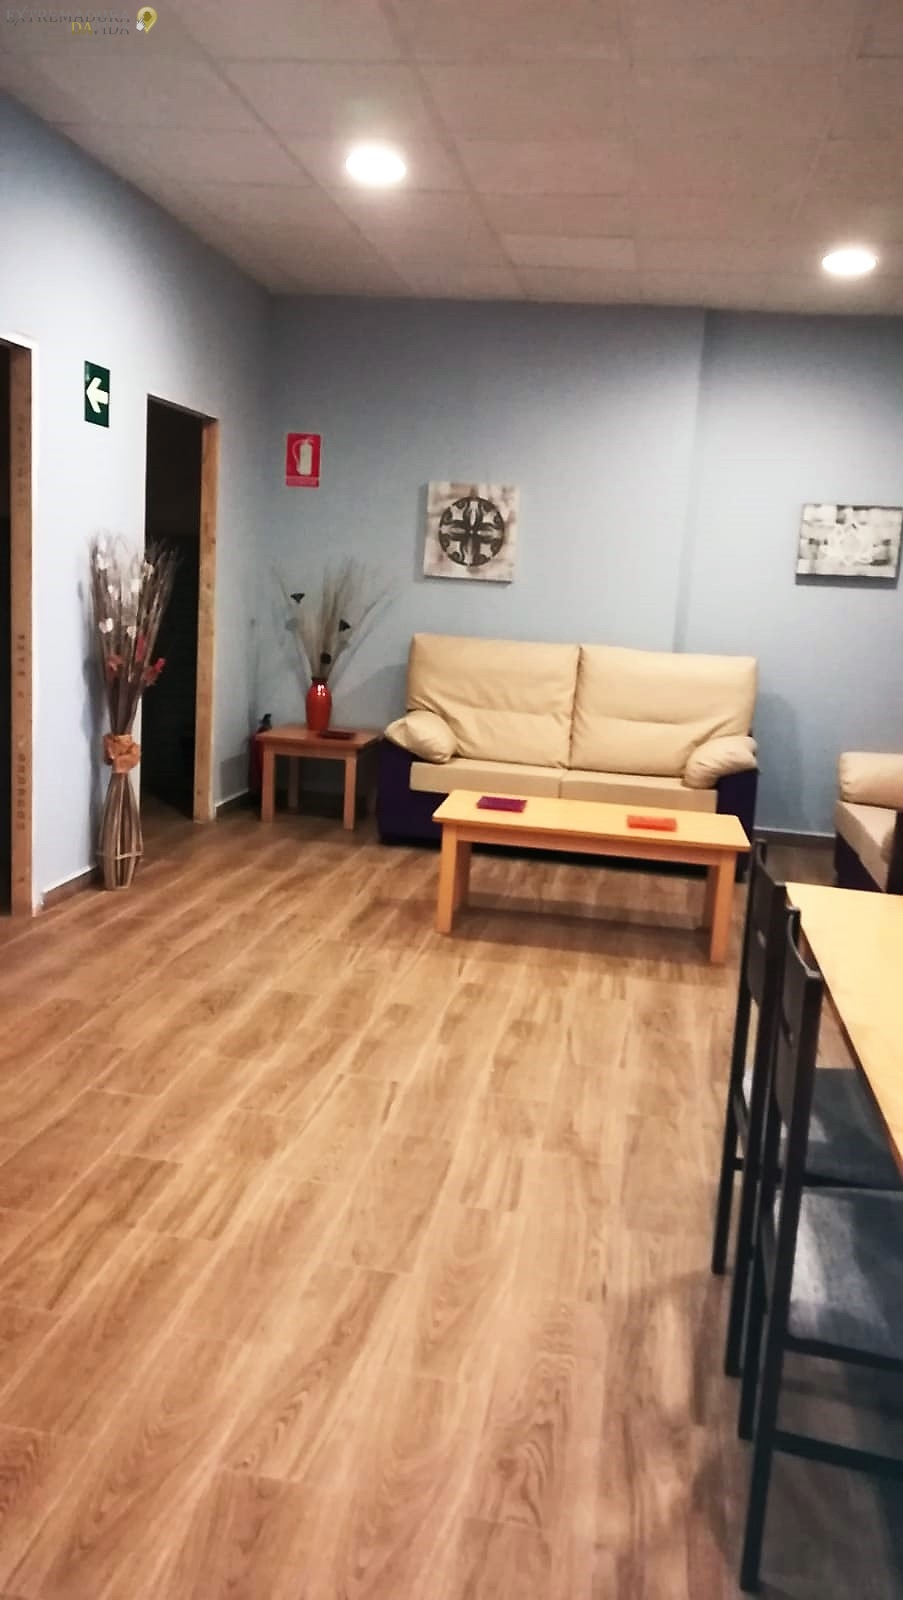 Crematorio para mascotas Plasencia Cáceres Quemascotas Malpartida de Plasencia